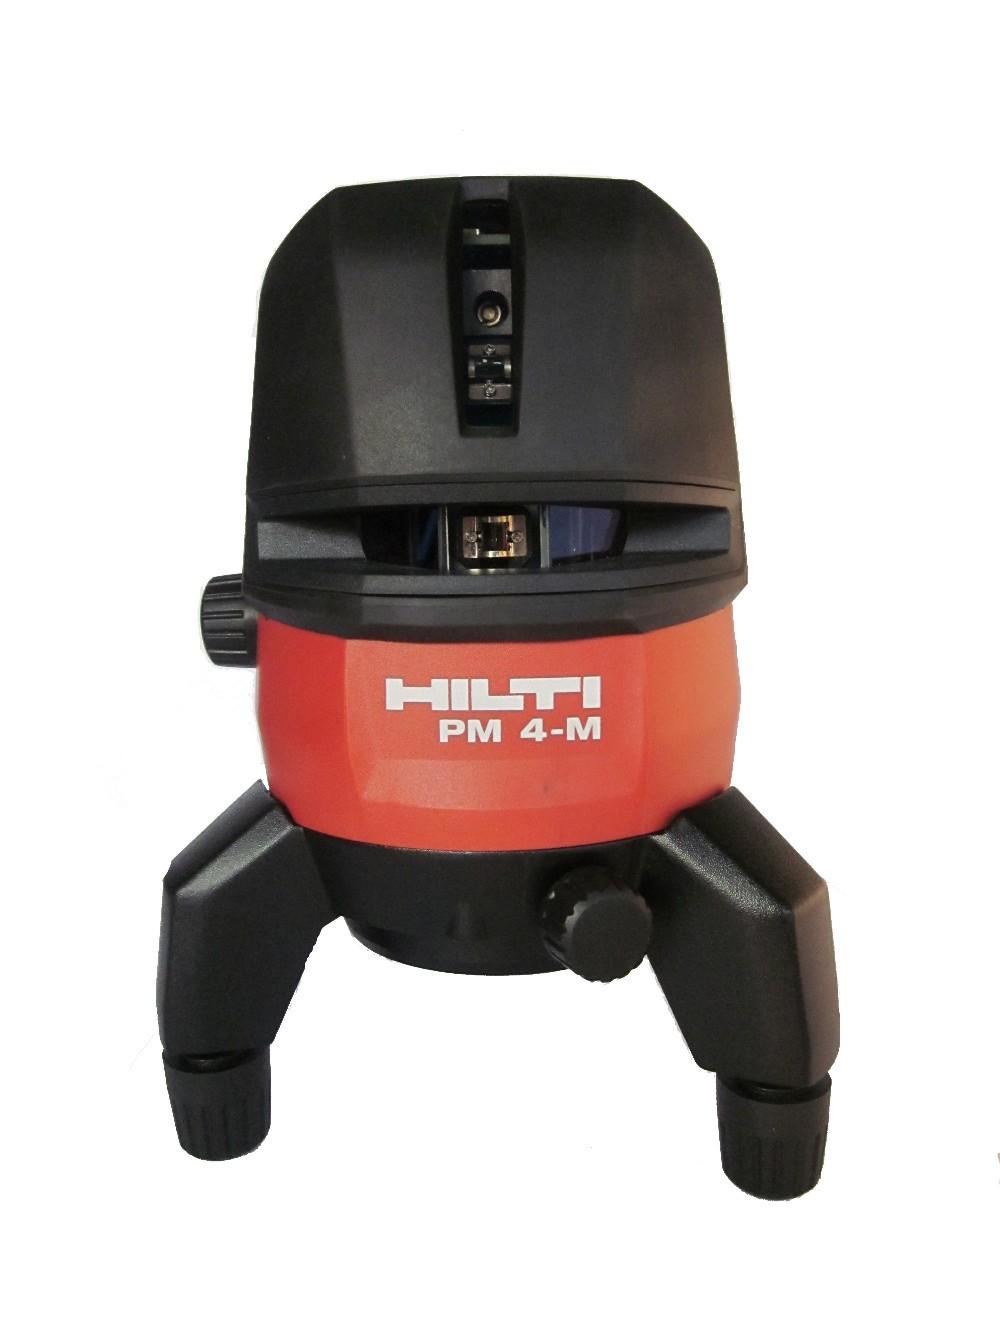 Hilti laser